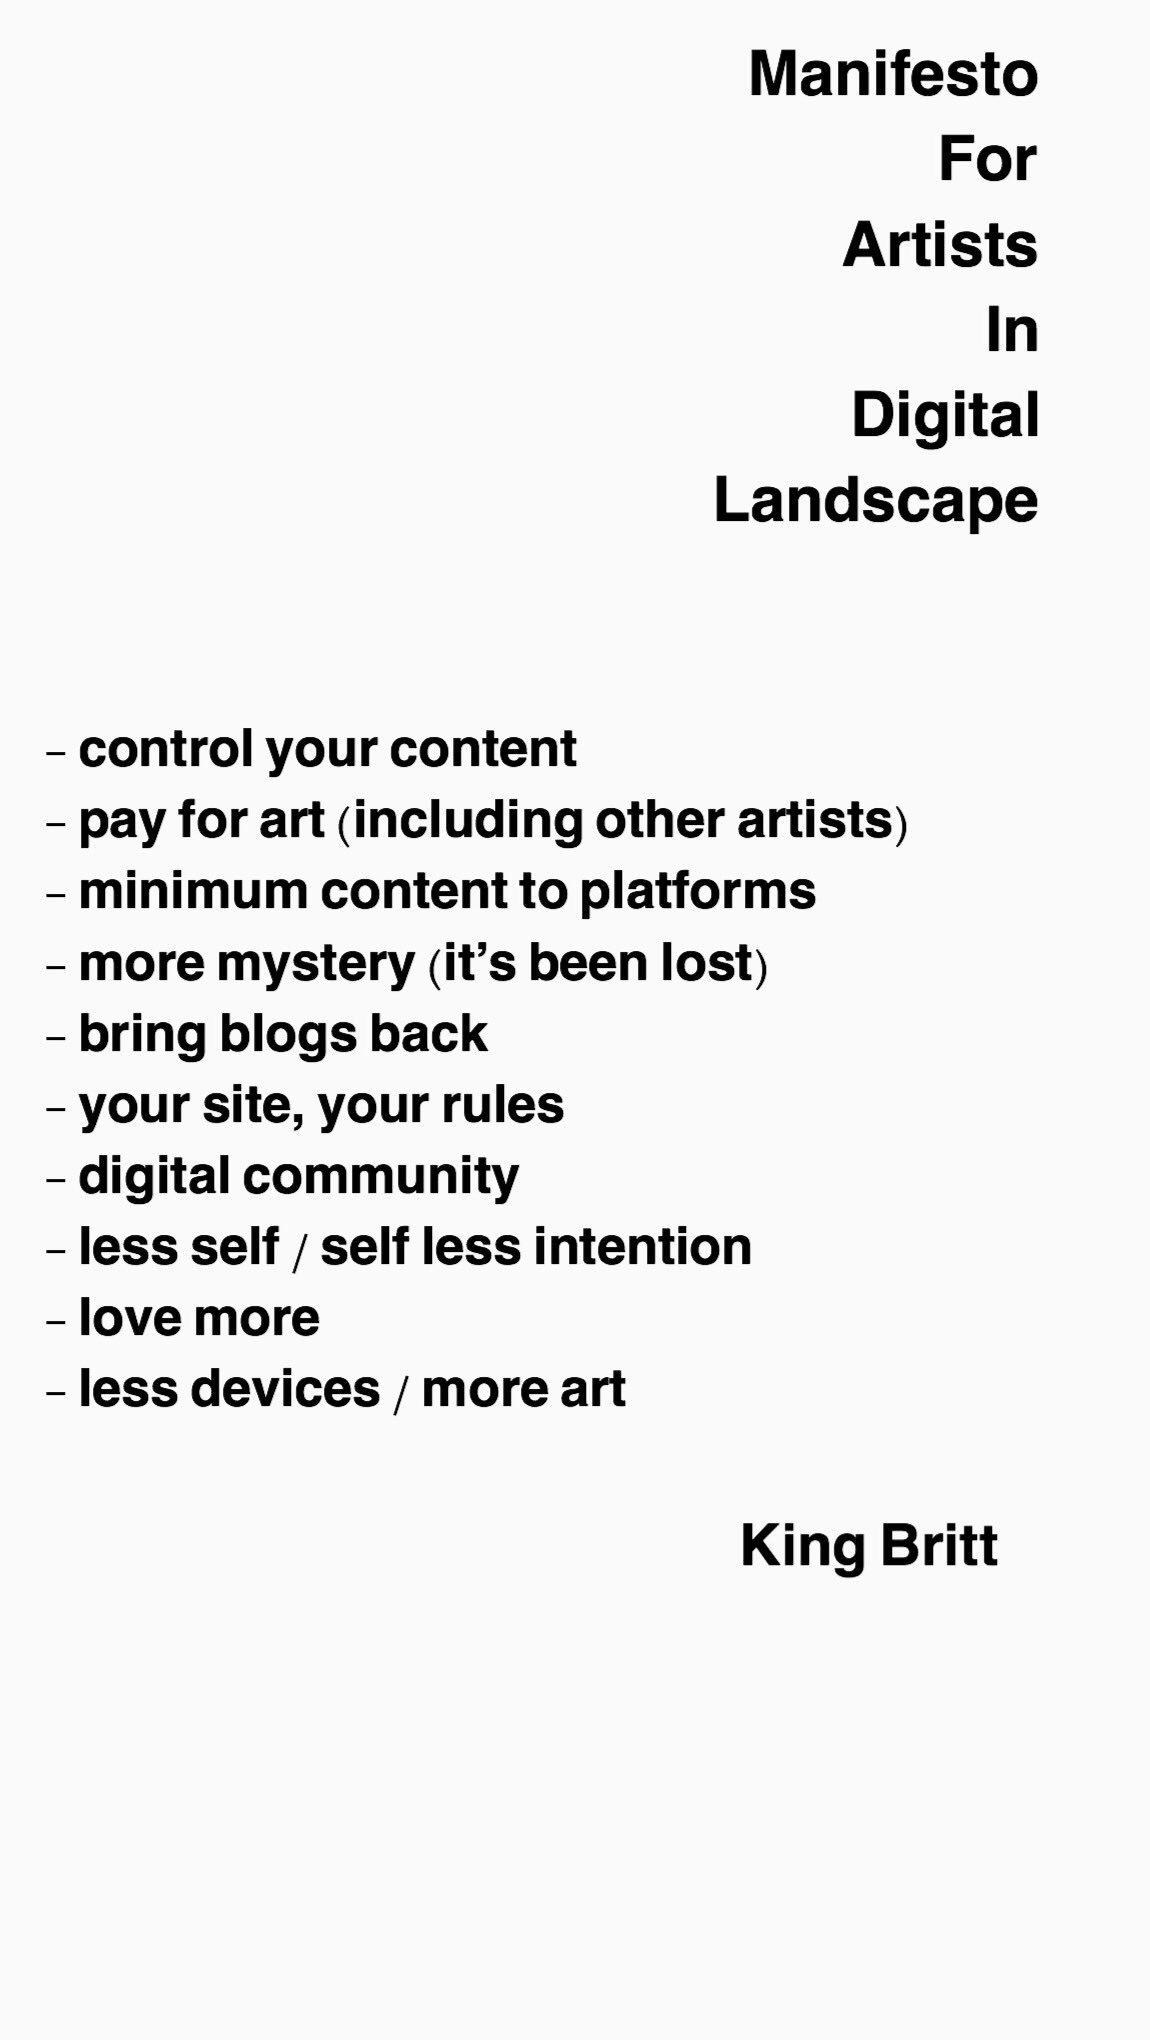 King Britt manifesto